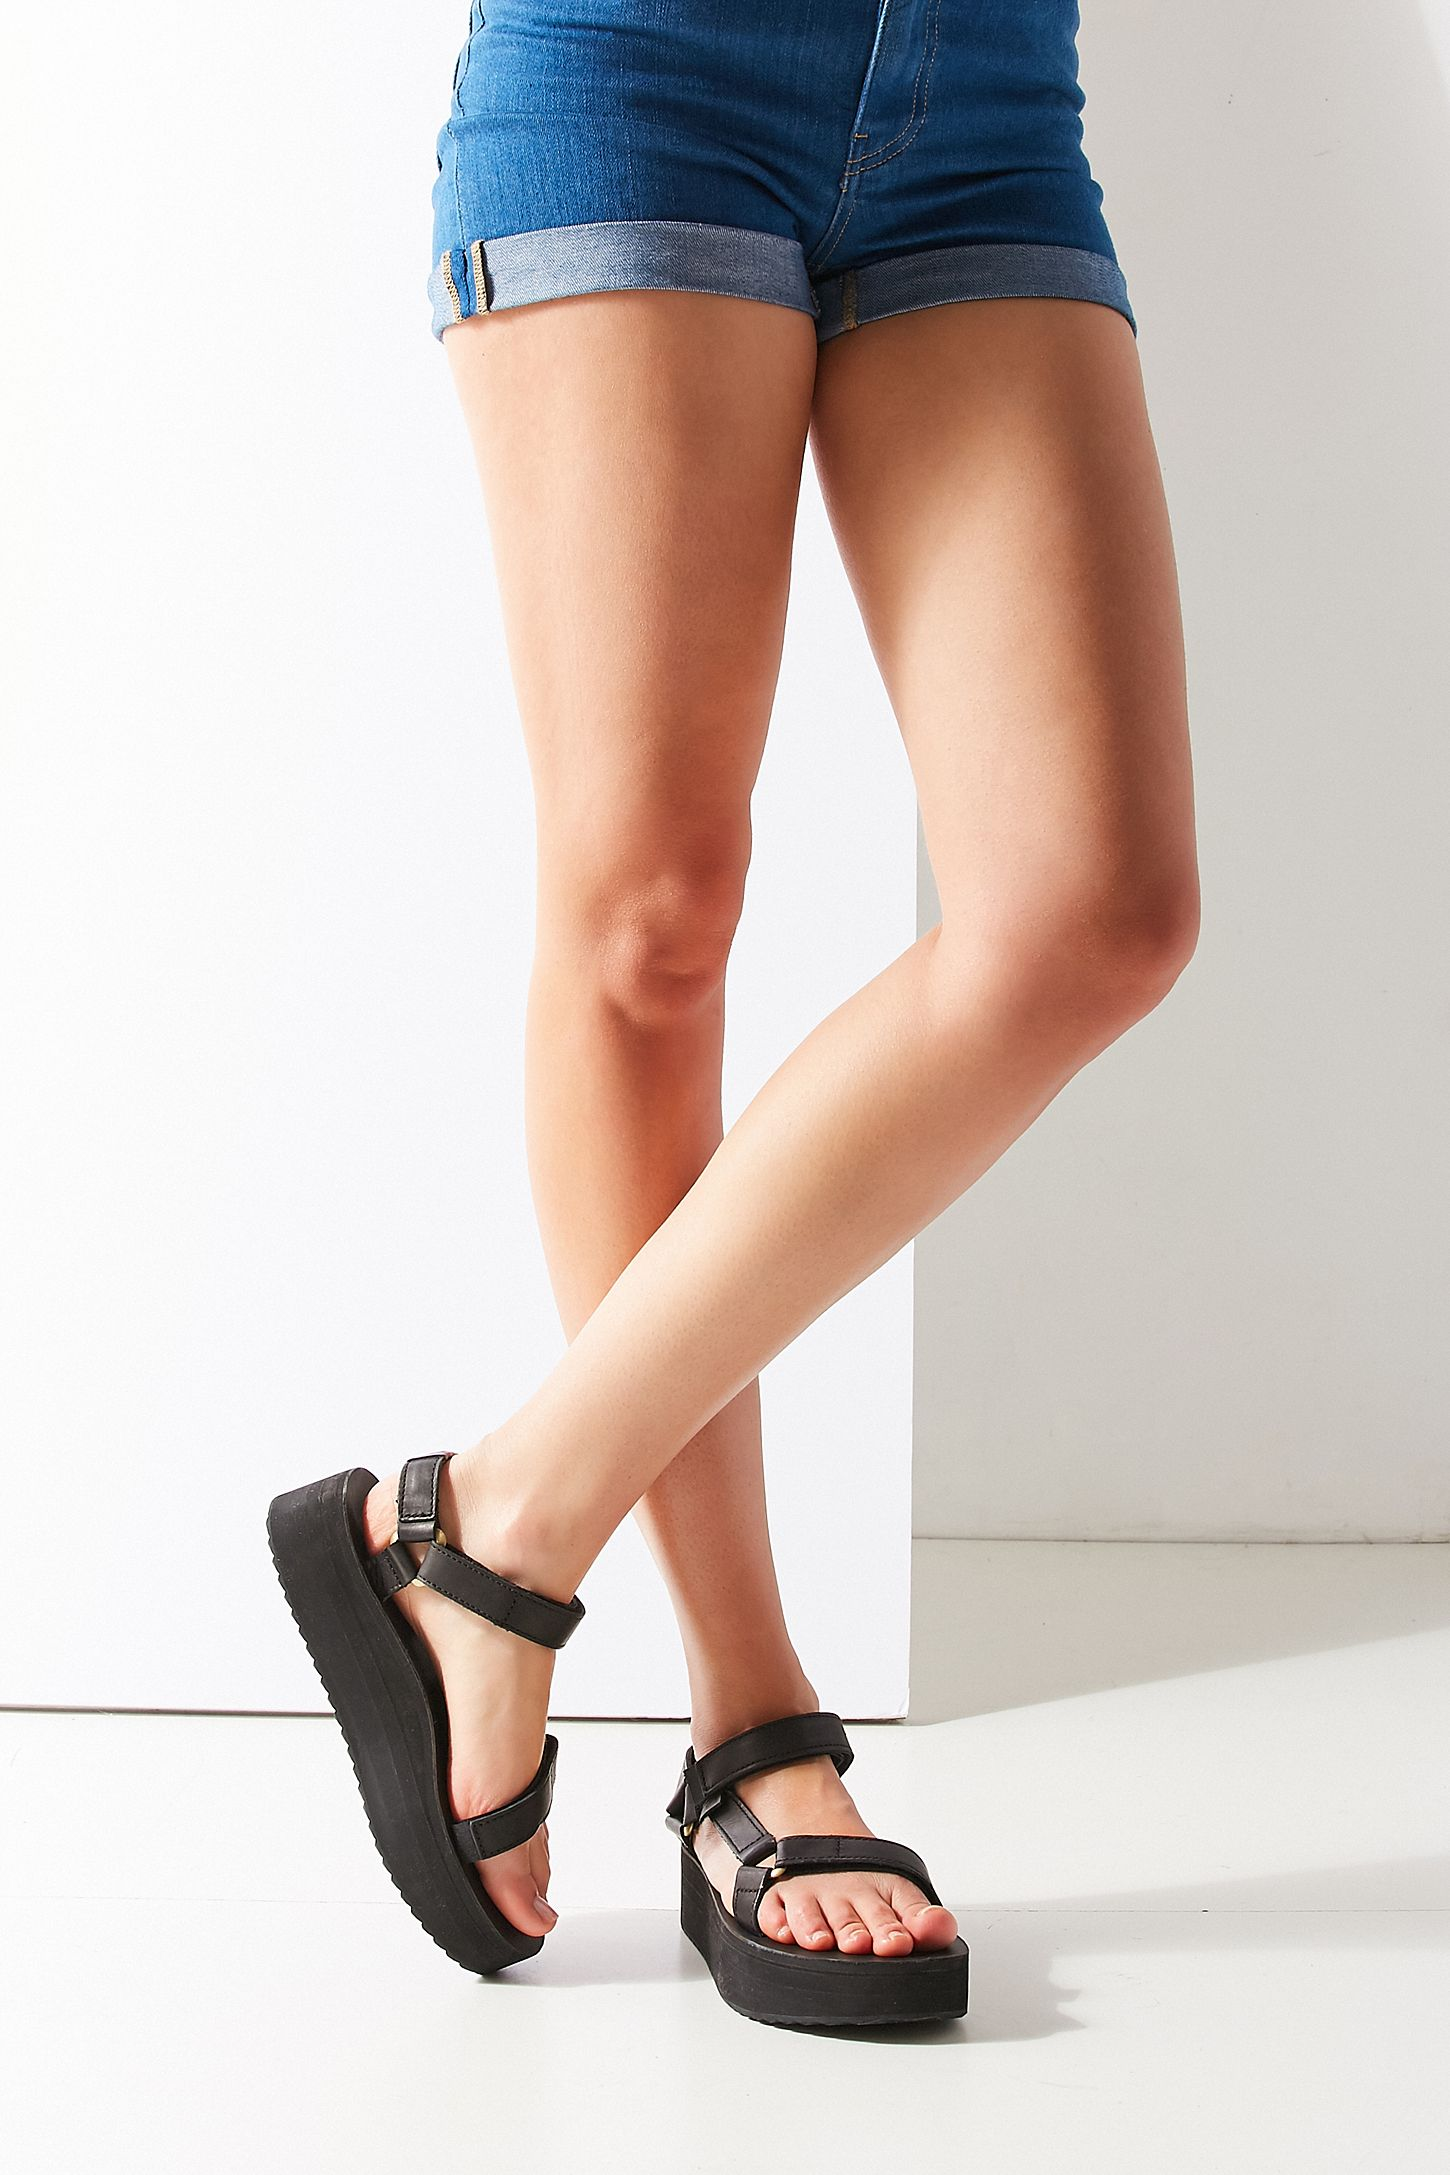 ce362056cceb Teva Universal Crafted Flatform Sandal